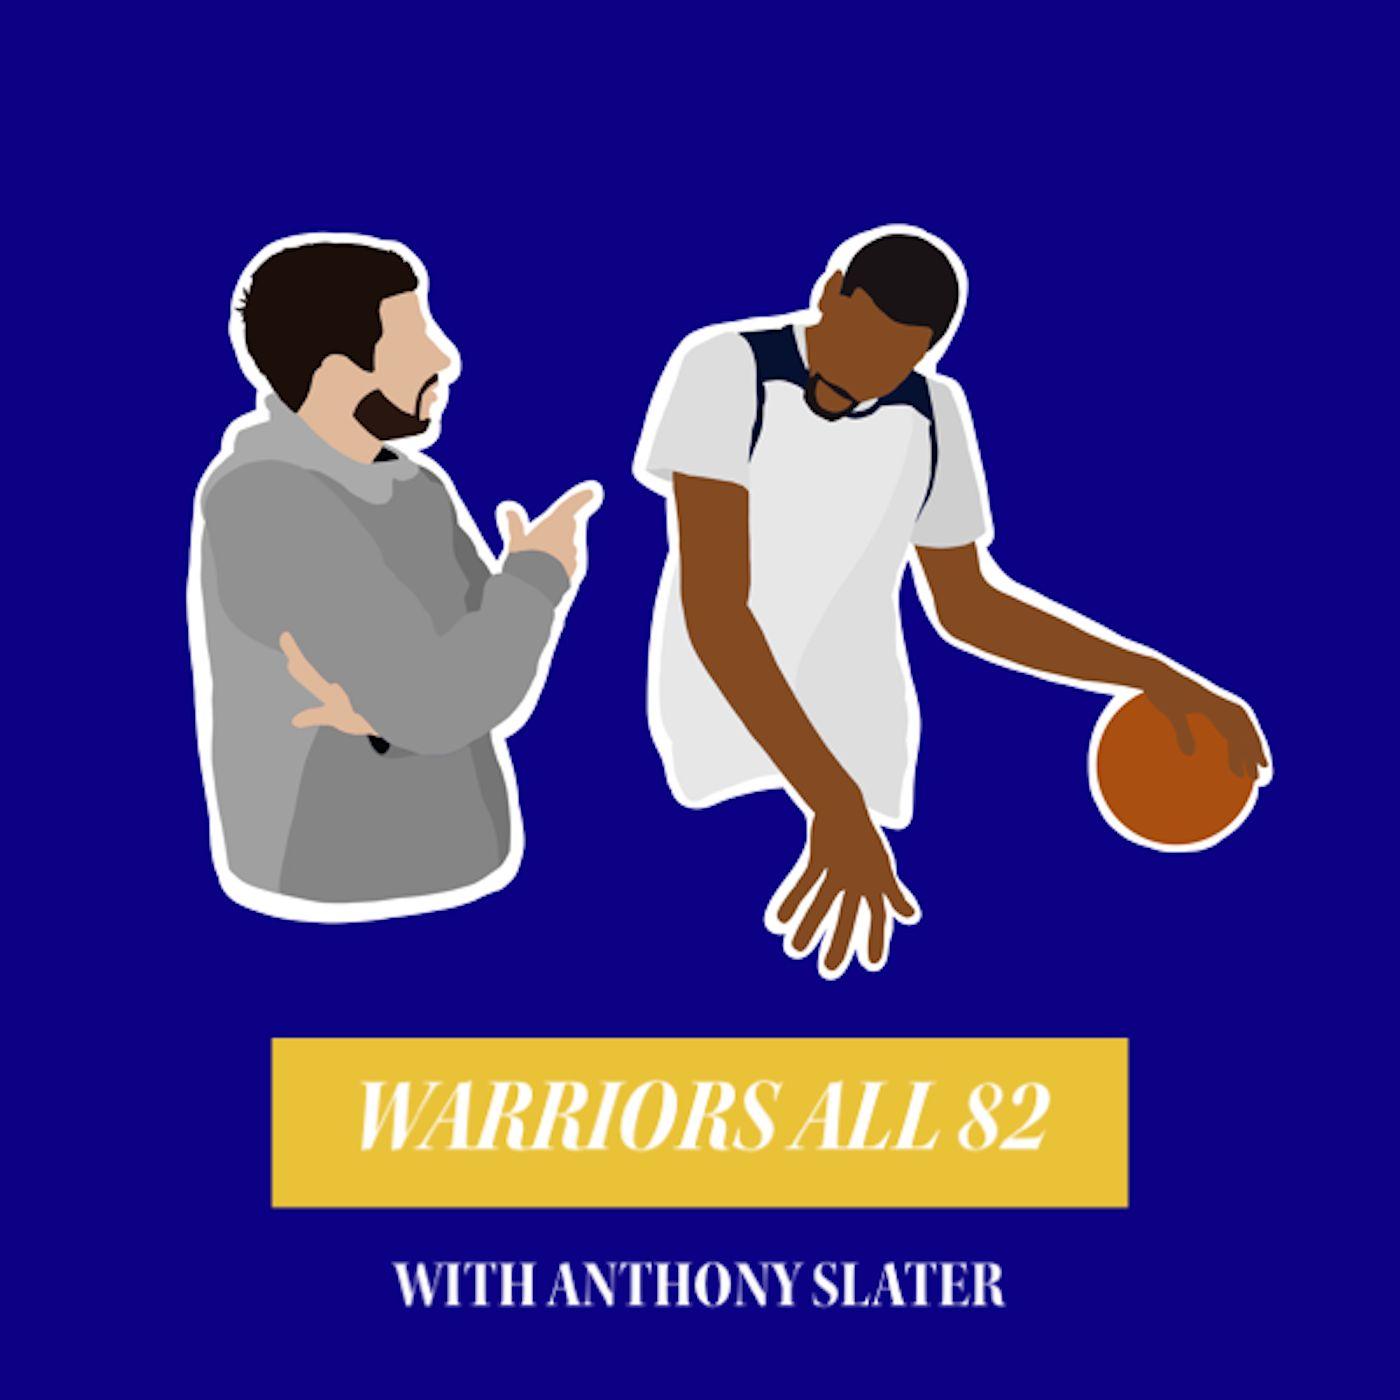 c0af7f19198e Warriors All 82 podcast